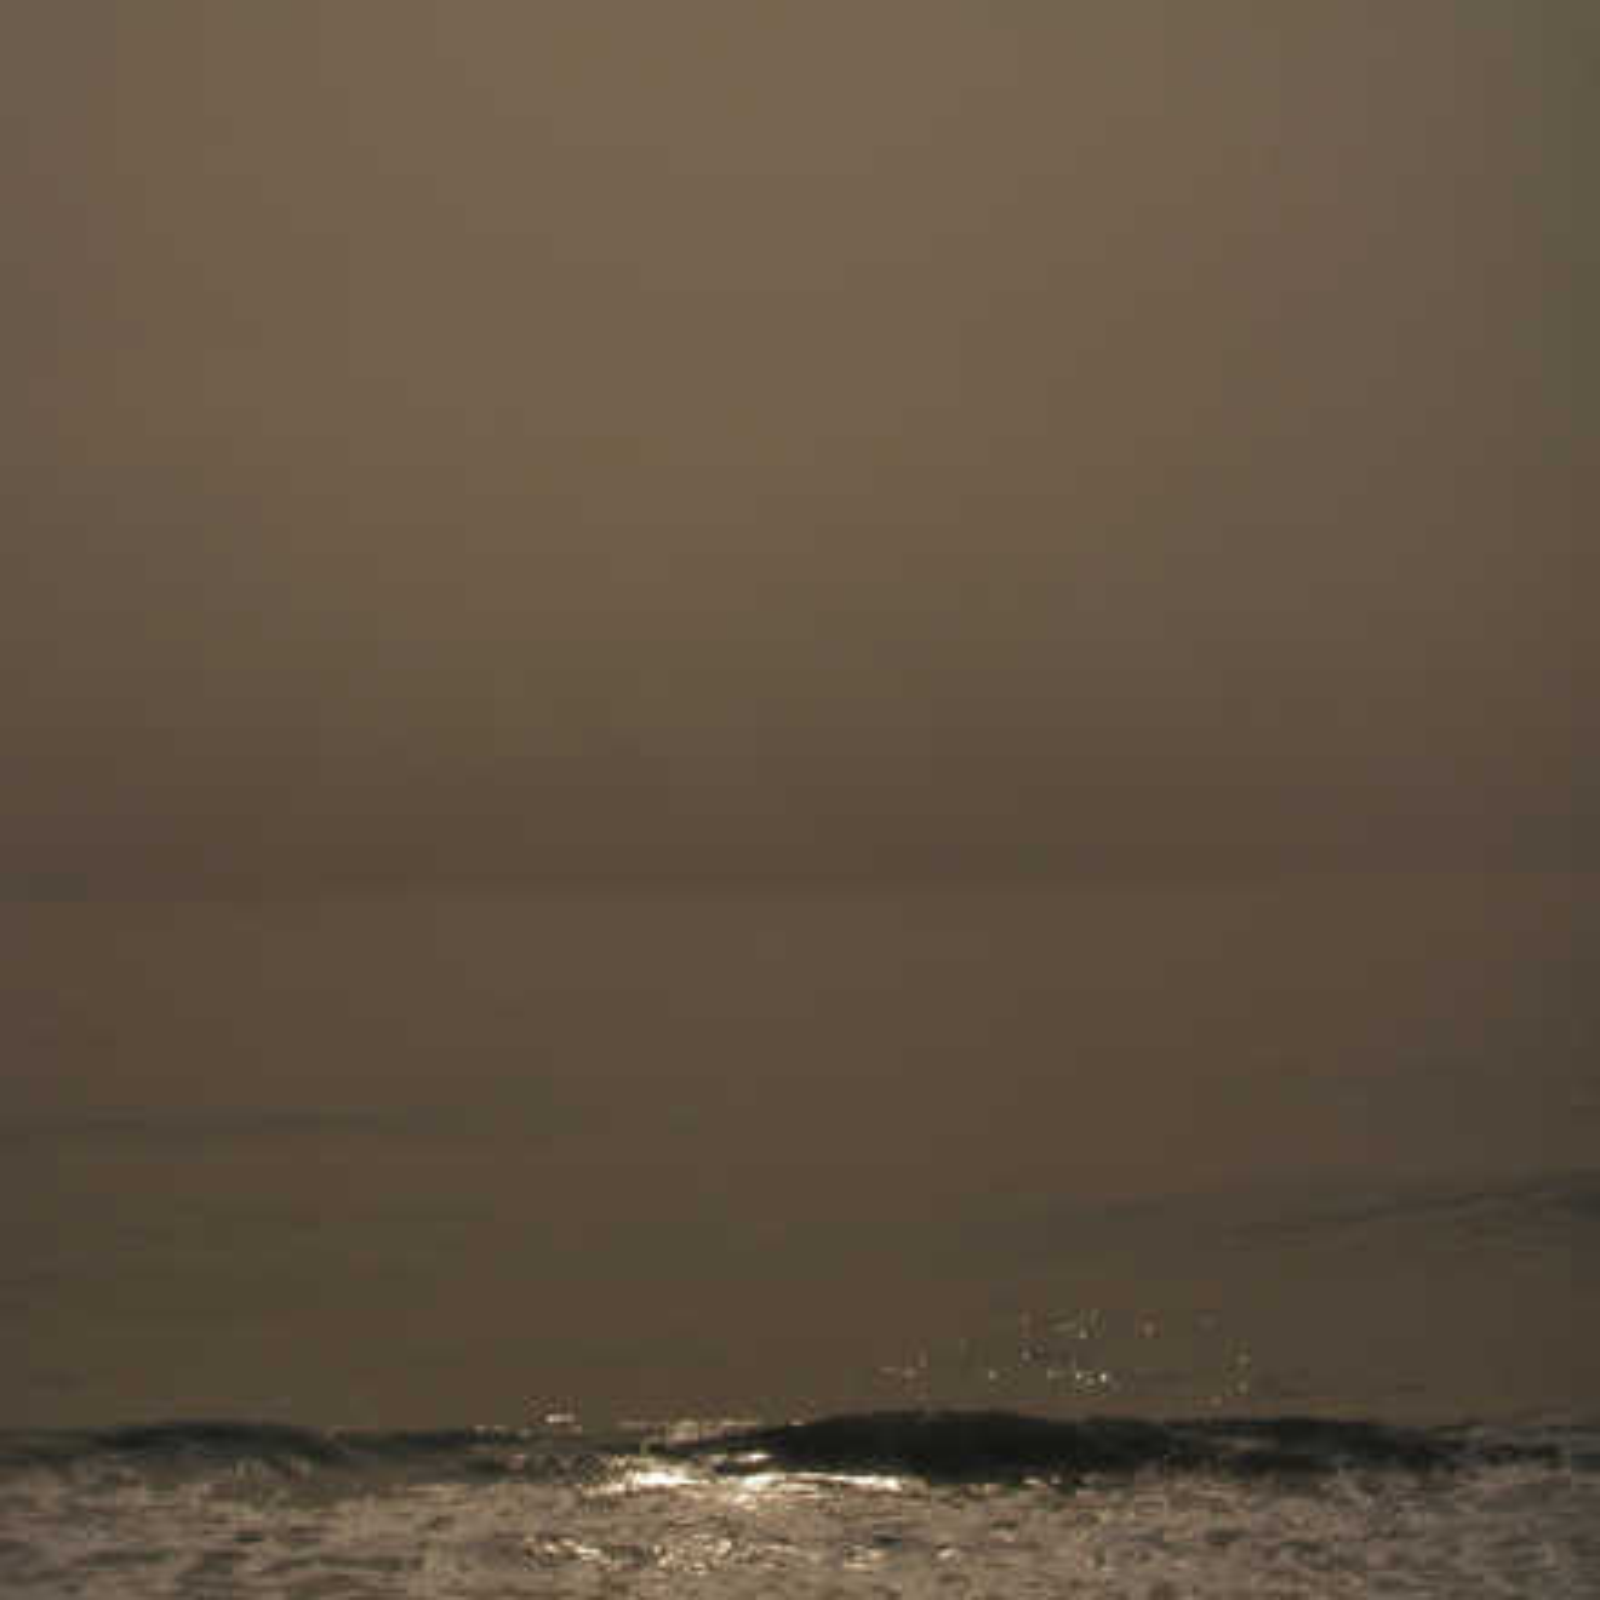 Wave 3110 - Douglas Busch